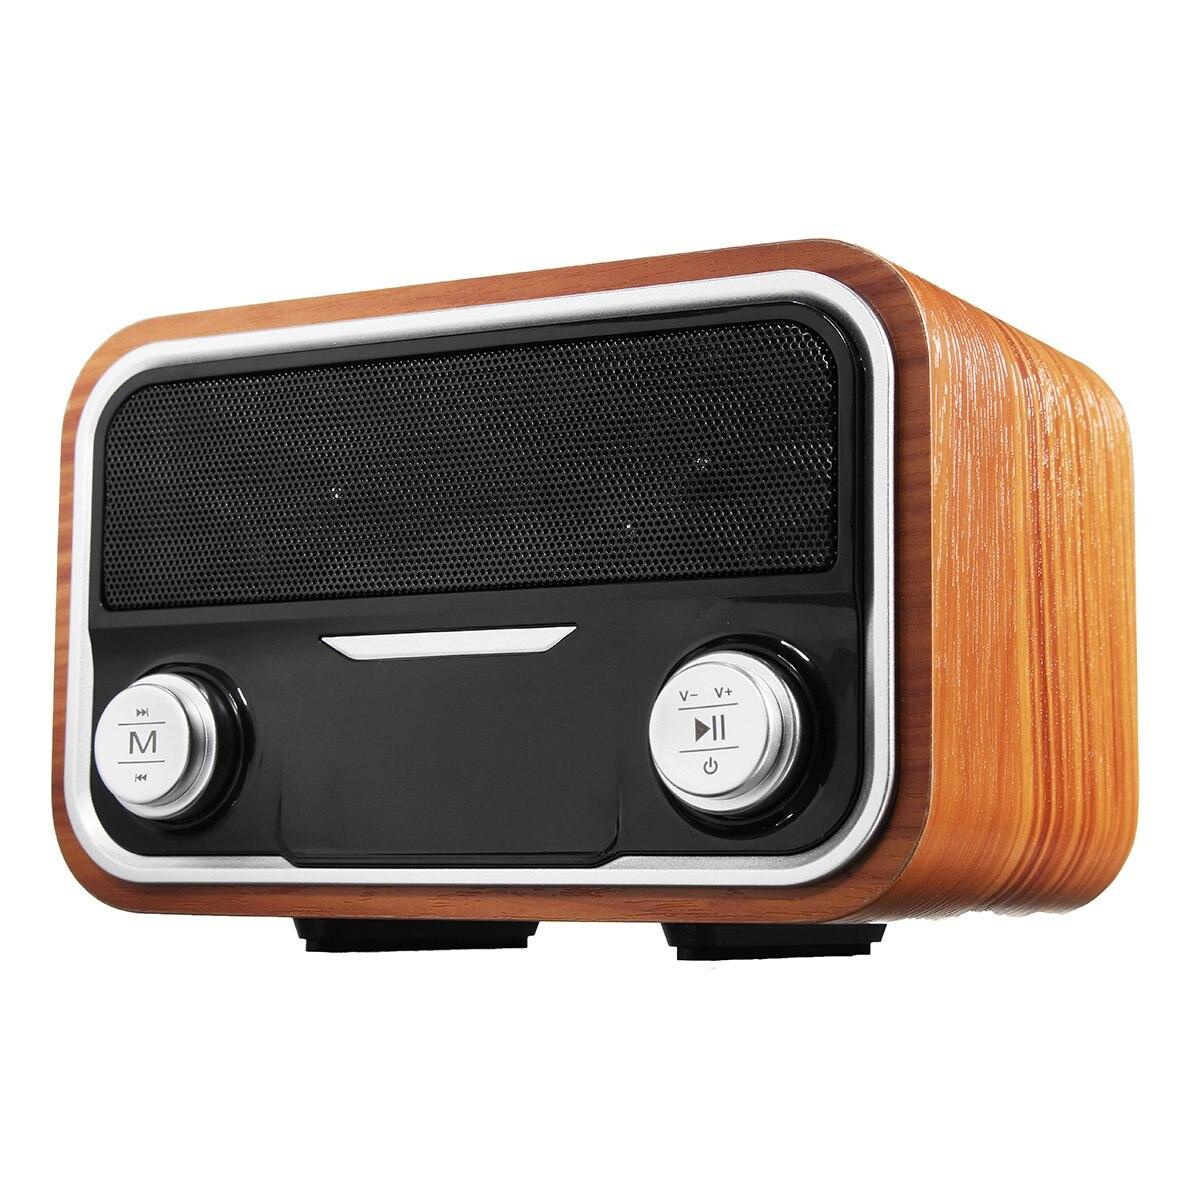 SENBOWE Retro Subwoofer Speaker Dual Loudspeaker Wooden Bluetooth Wireless Speaker FM Radio Handfree TF Speaker